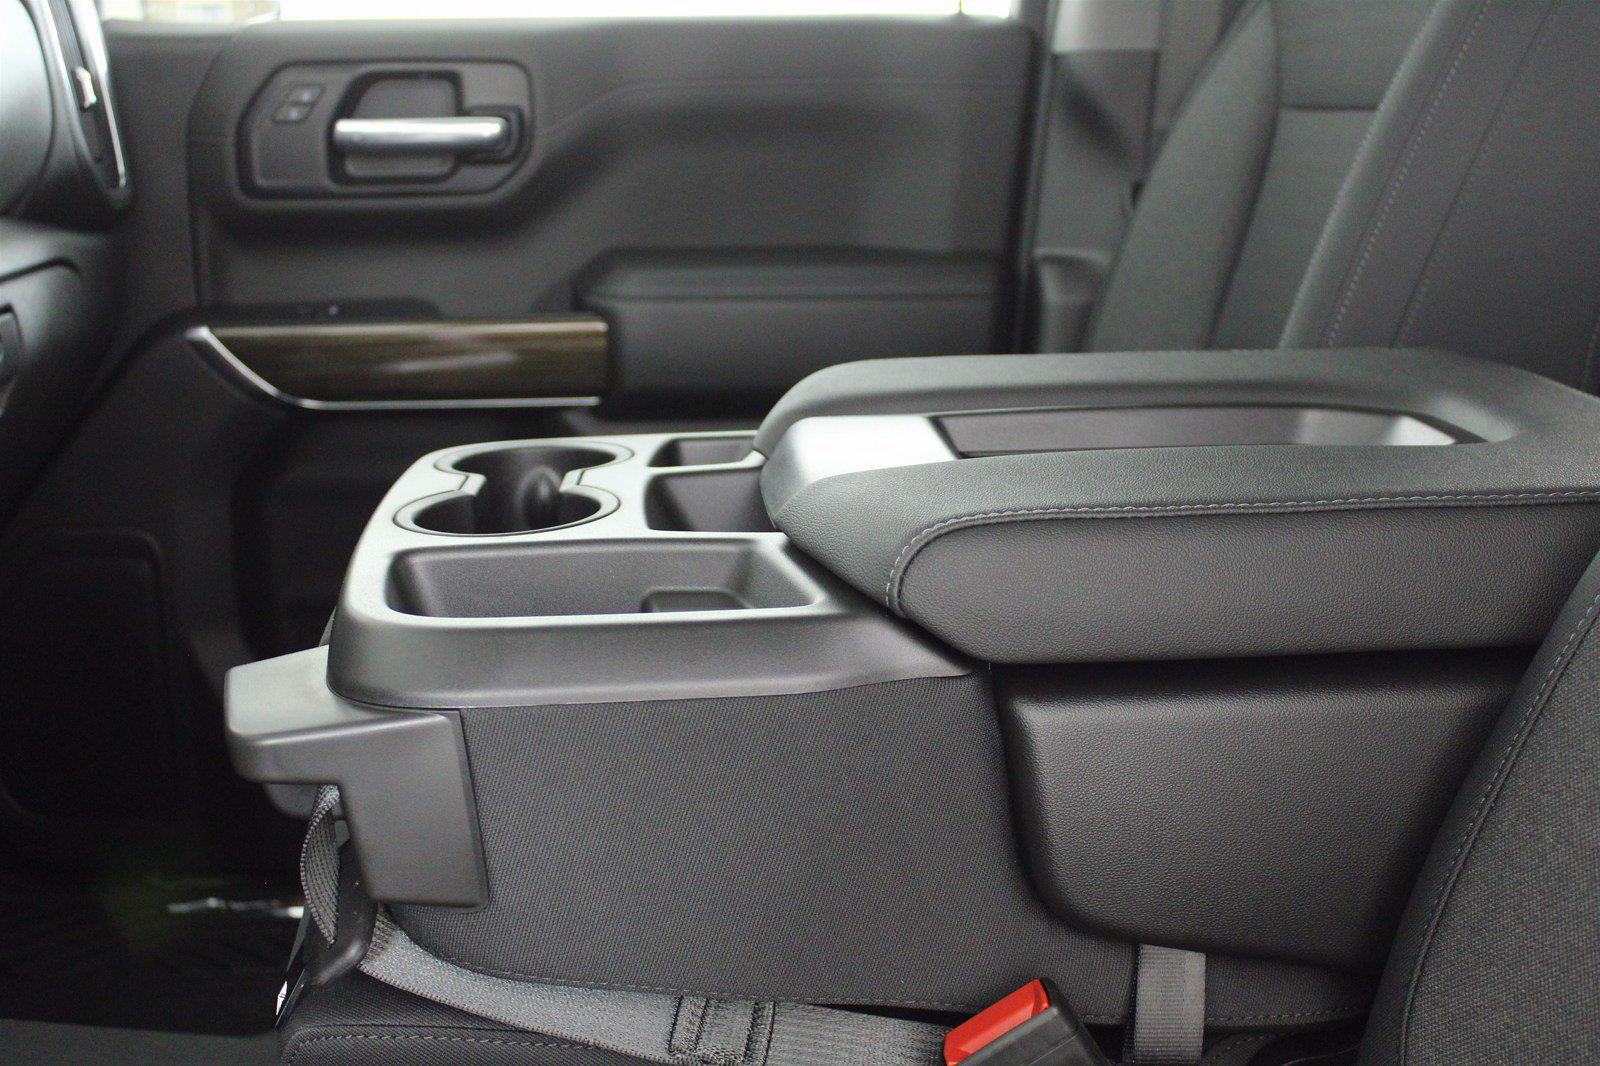 2021 Chevrolet Silverado 1500 Crew Cab 4x4, Pickup #D111144 - photo 13